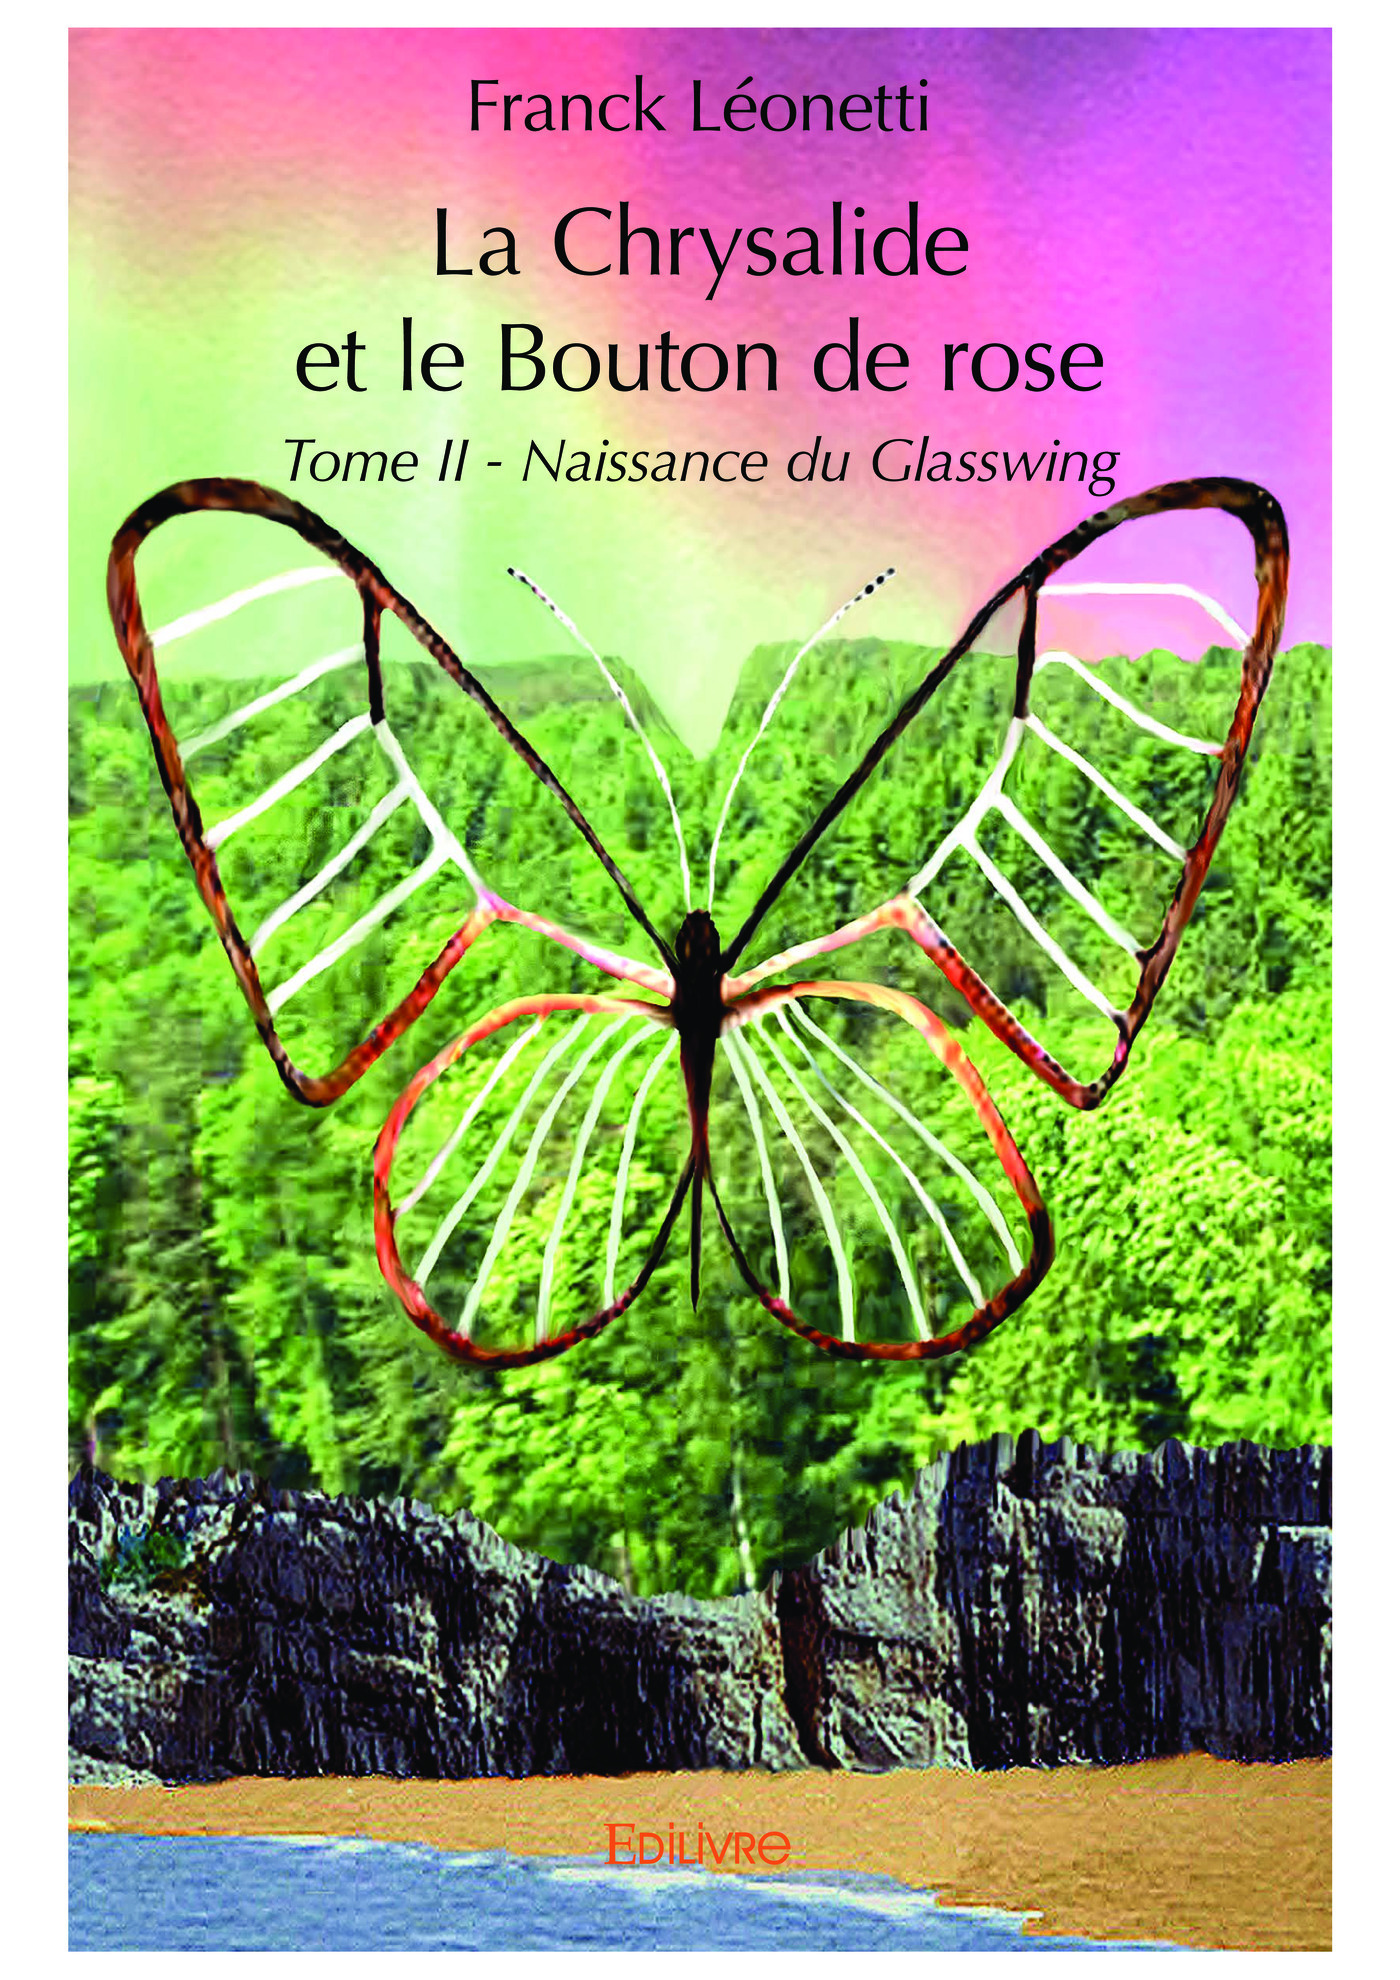 La Chrysalide et le Bouton de rose - Tome II